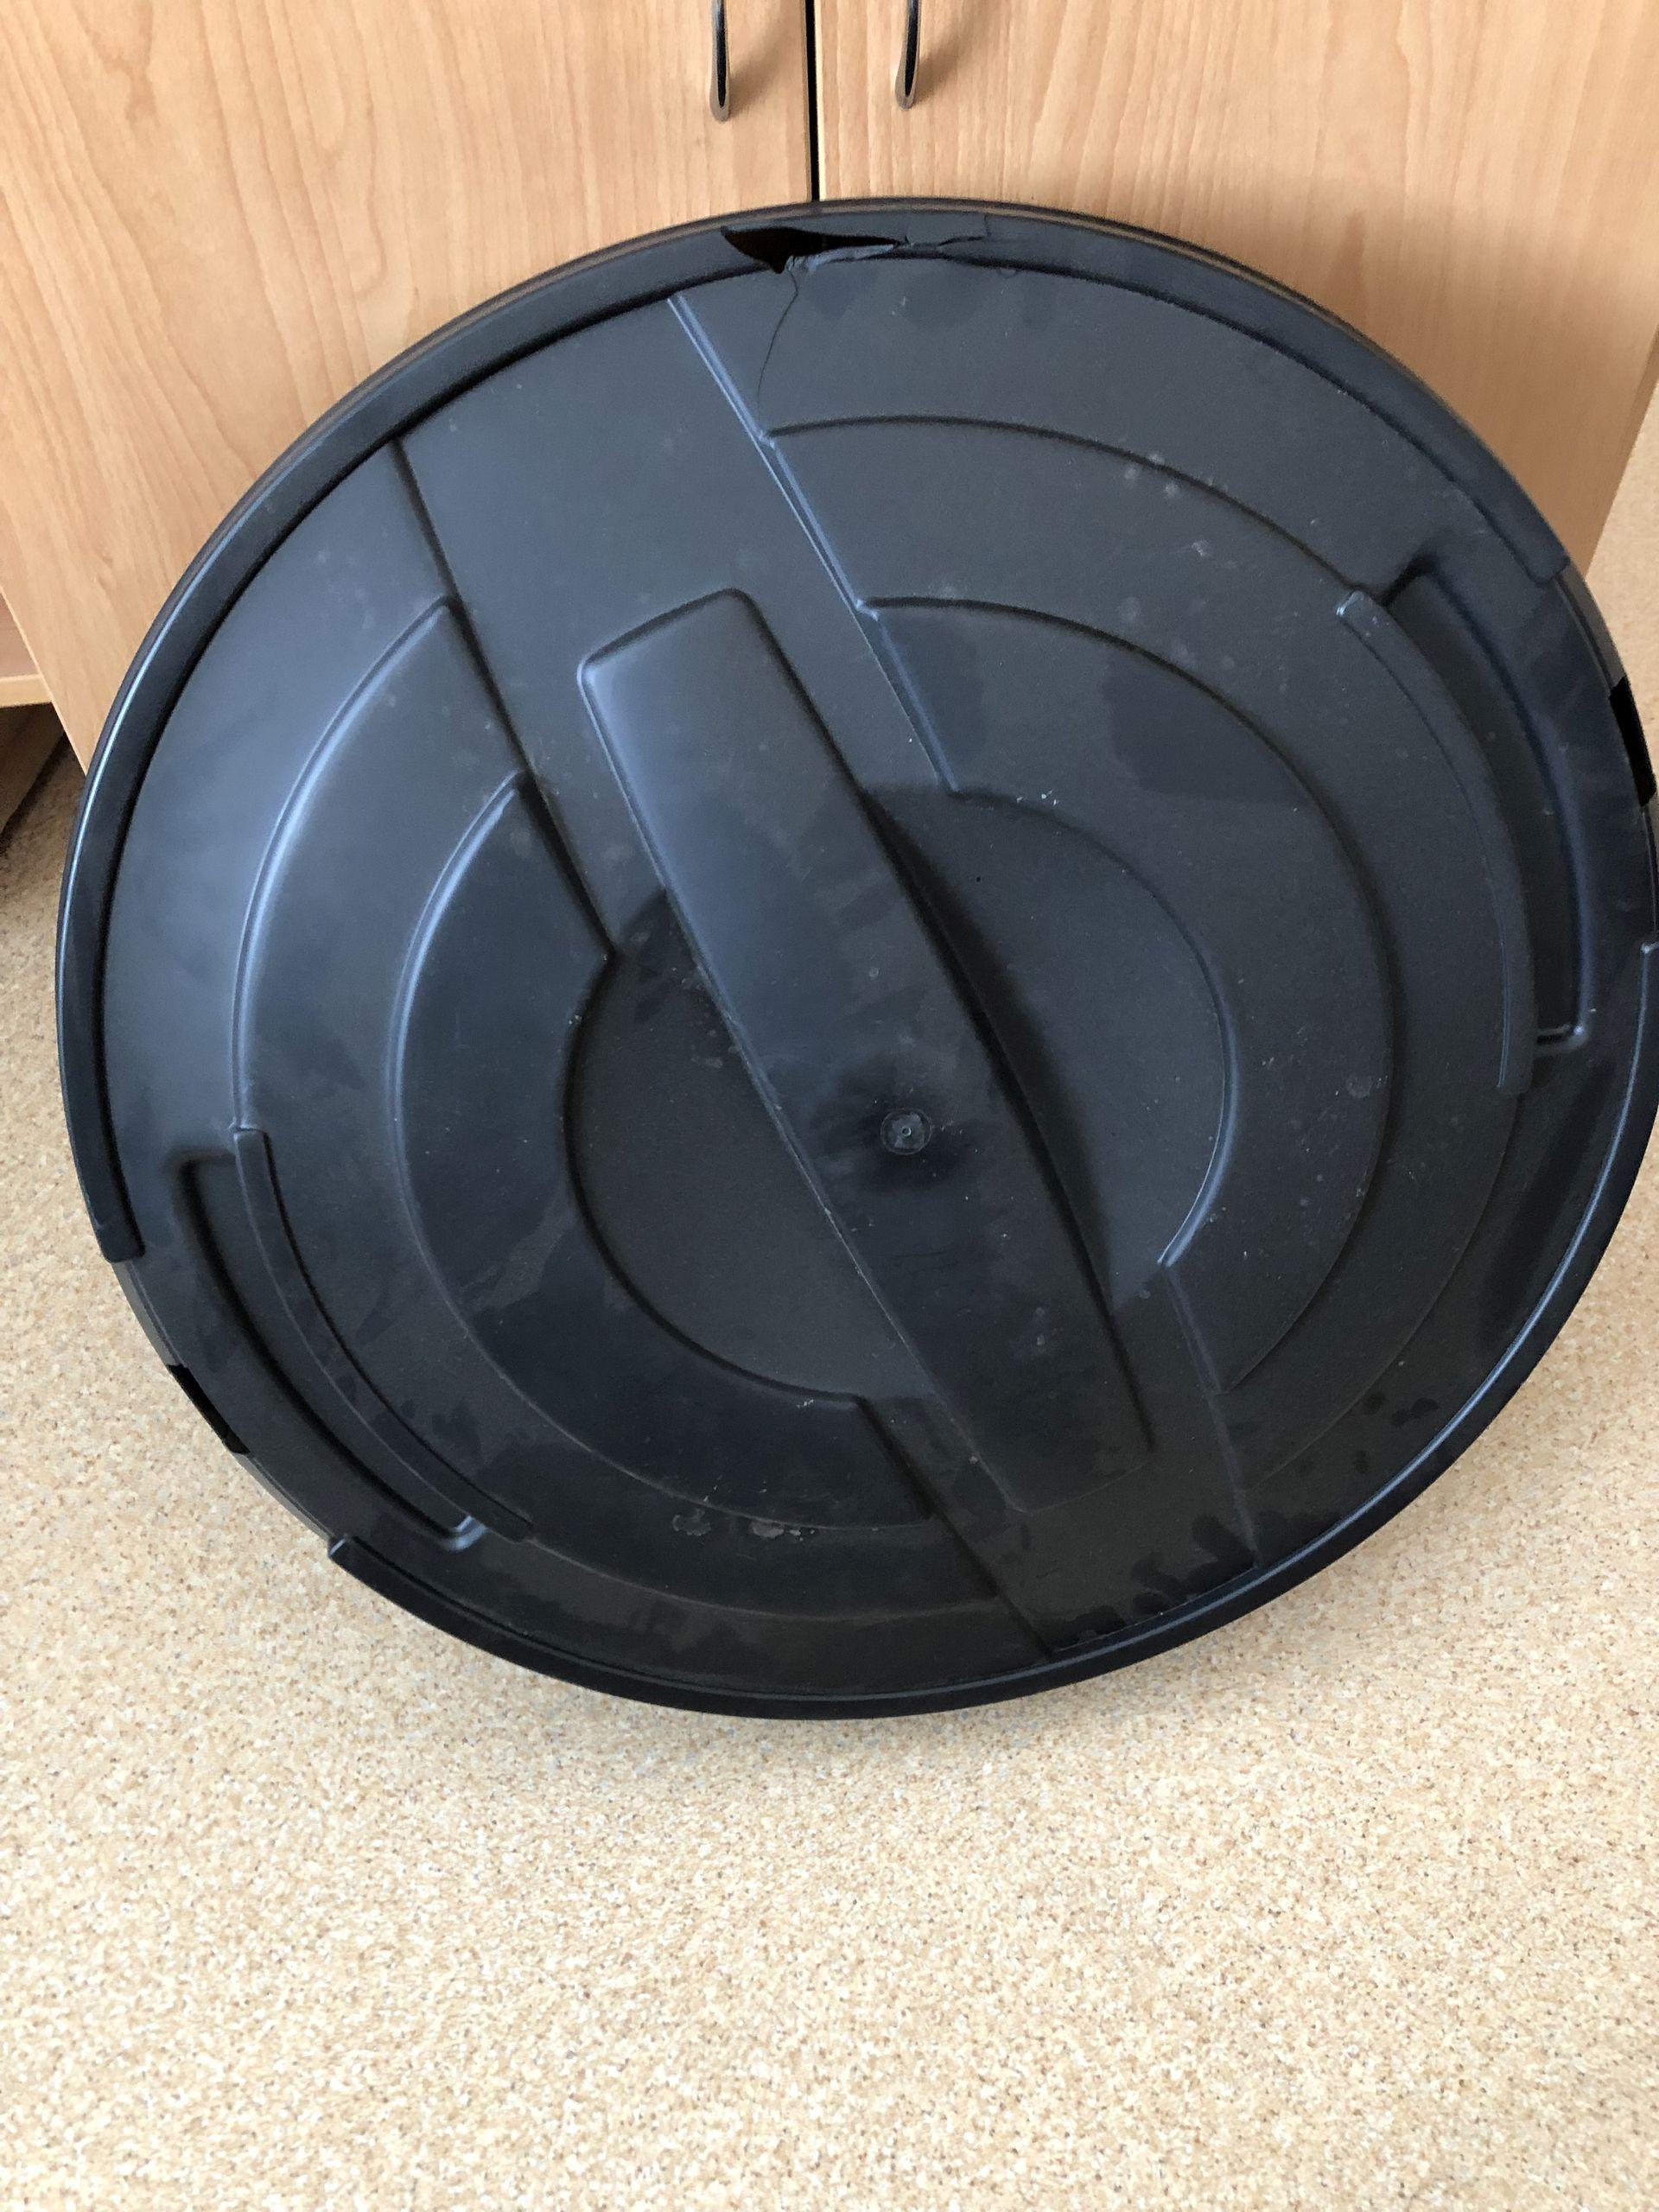 VÝPRODEJ Prosperplast RAINCAN sud na dešťovou vodu 210l, černý IDRA210 POŠKOZENÉ VÍKO